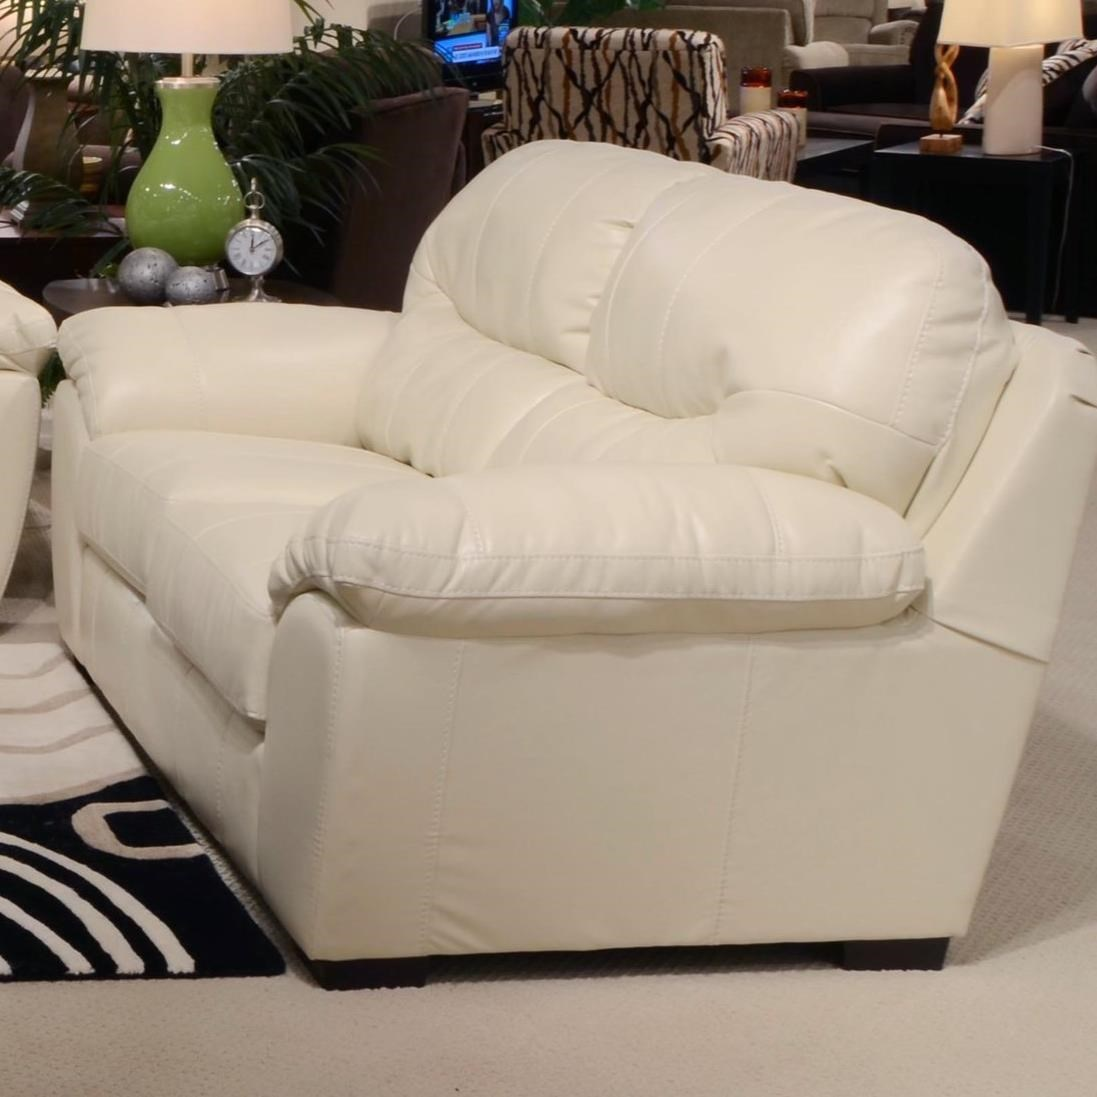 Jackson Furniture Grant Loveseat - Item Number: 4453-02-1262-01-3062-01